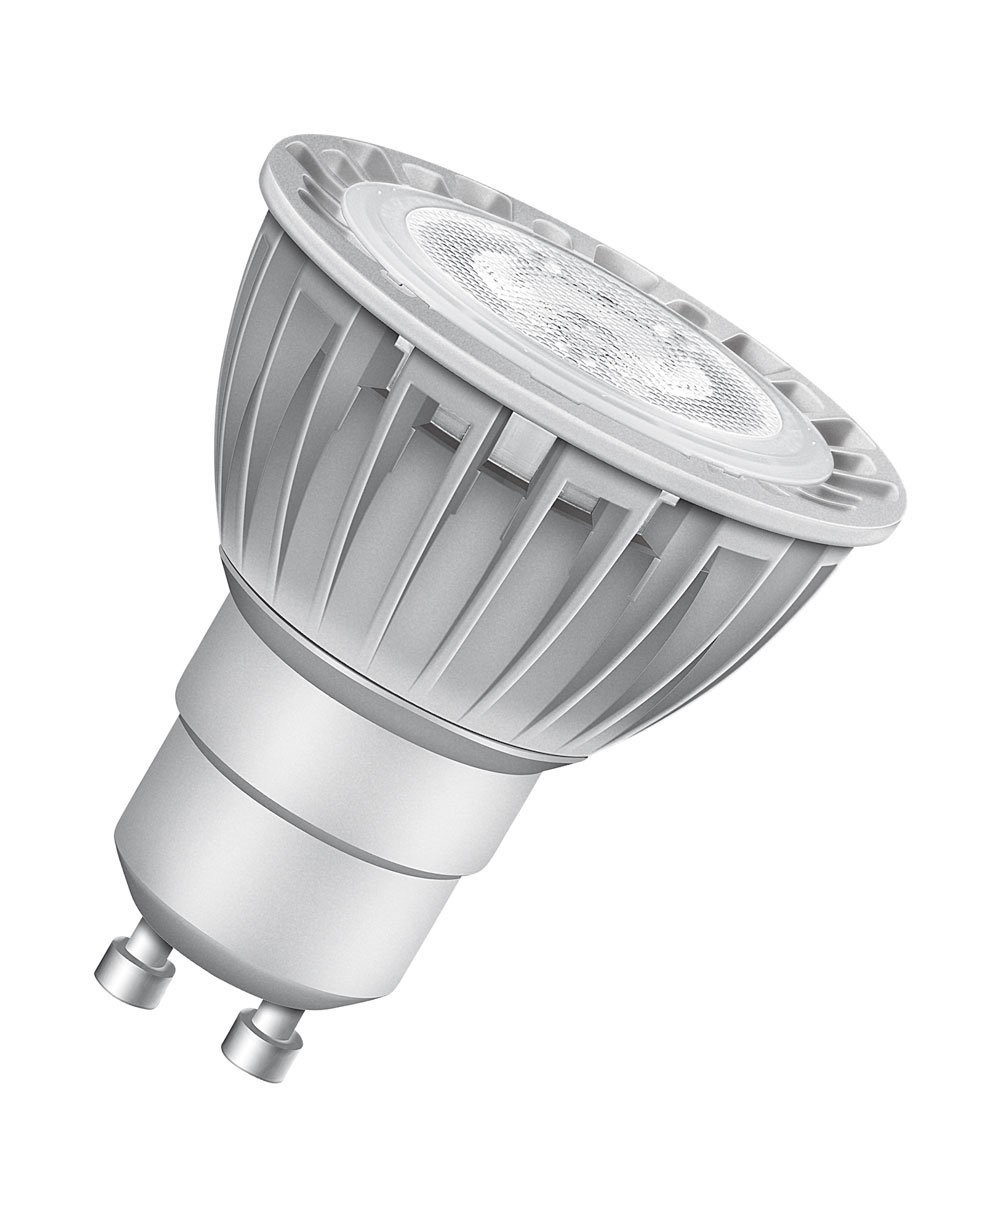 GU10 LED Leuchtmittel OSRAM